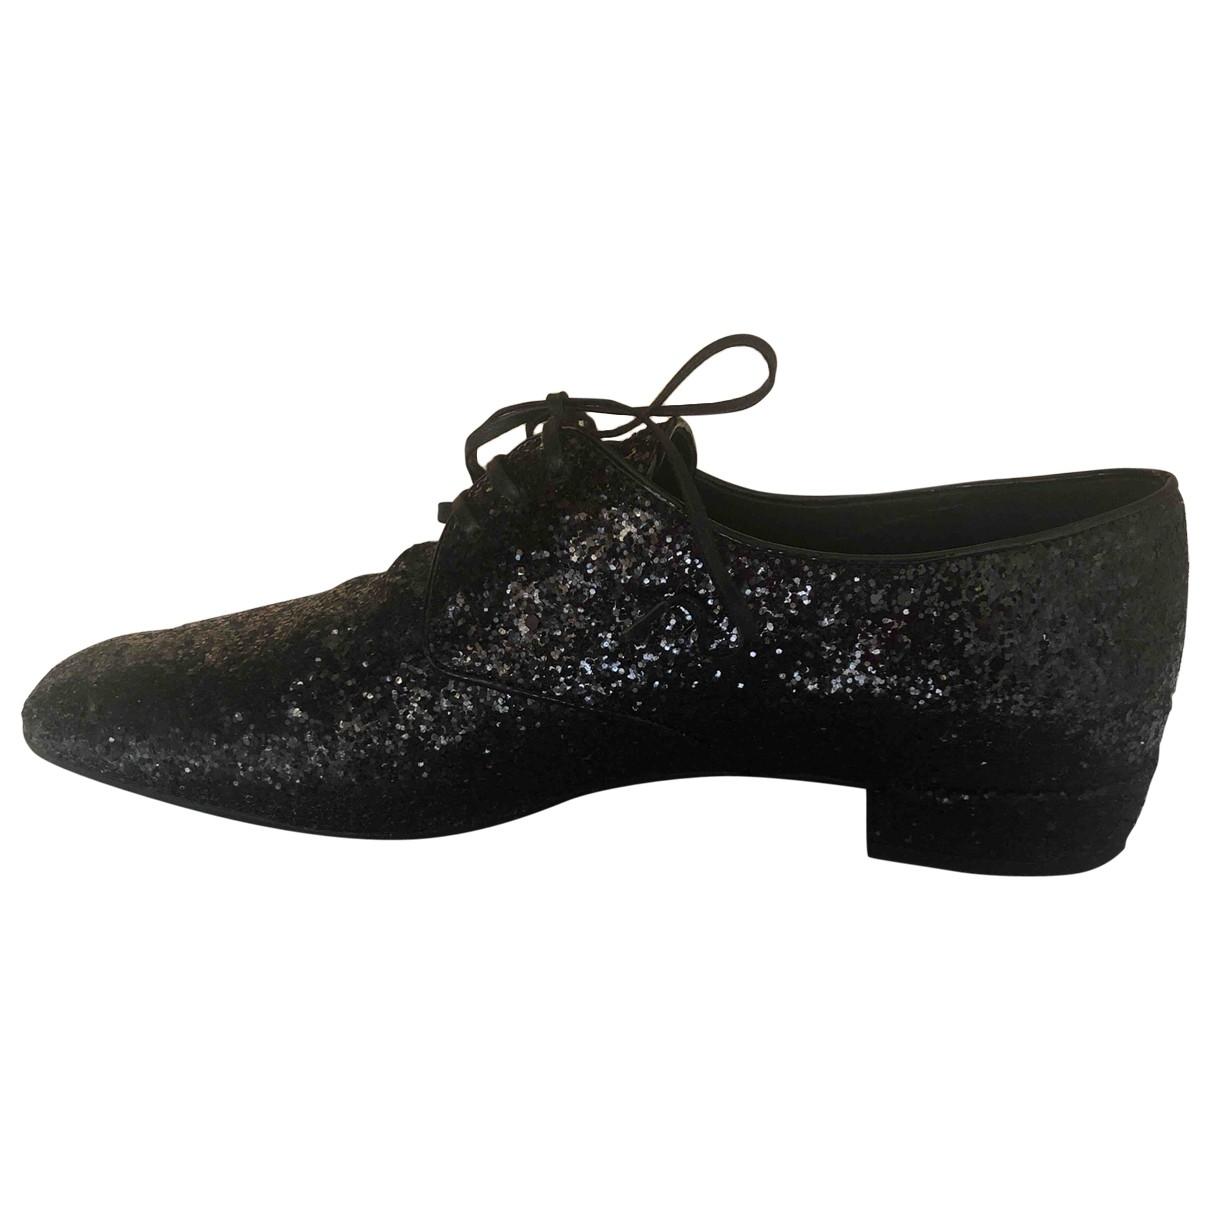 Prada \N Black Glitter Lace ups for Women 37 EU